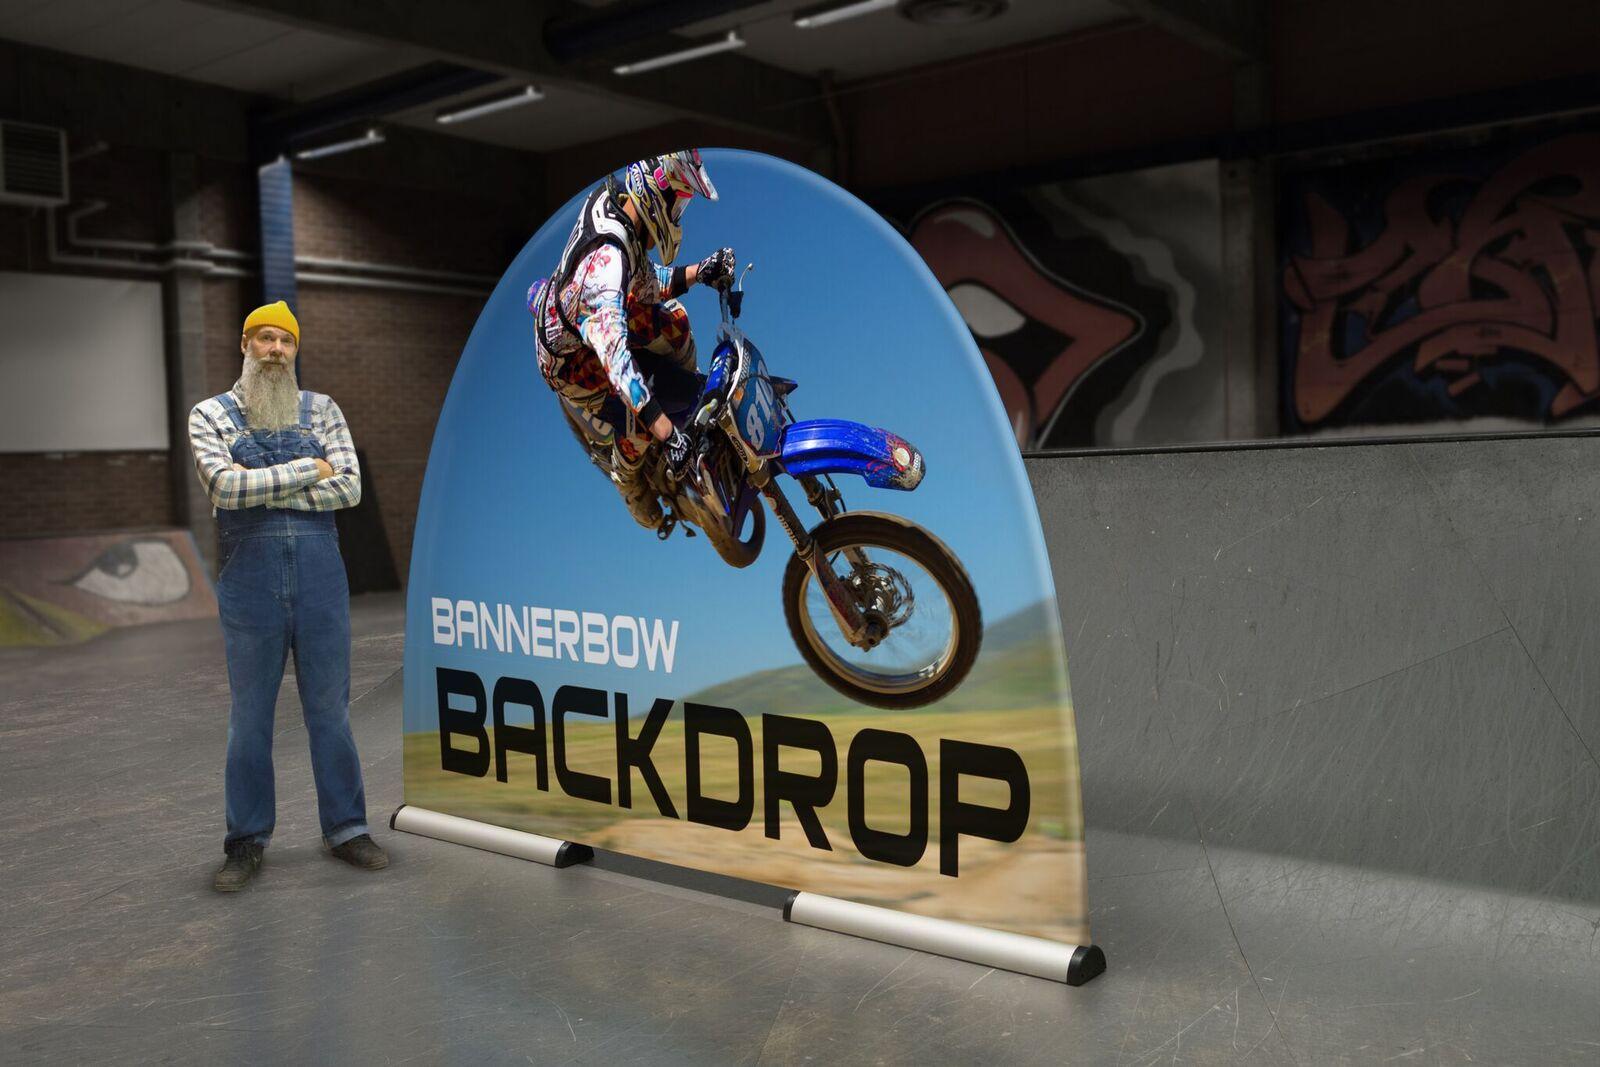 Backdrop Motorcross Werbefläche